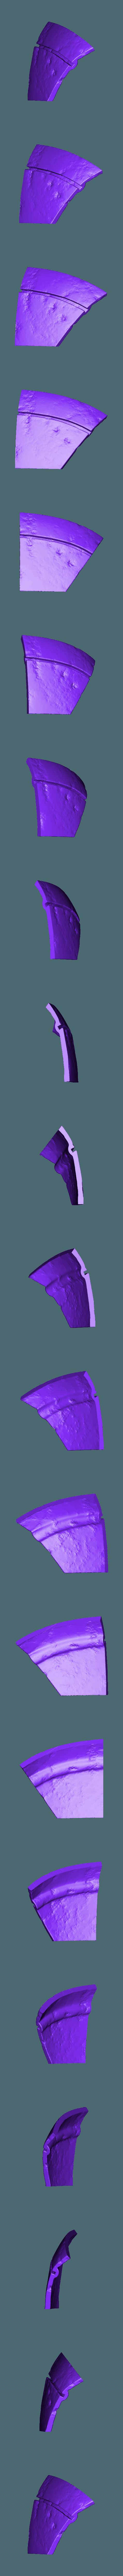 Armory_Damaged_Print11.obj Download OBJ file Armory - Knights of Ren Helmet (damaged), 3D print model • 3D print design, 3D-mon